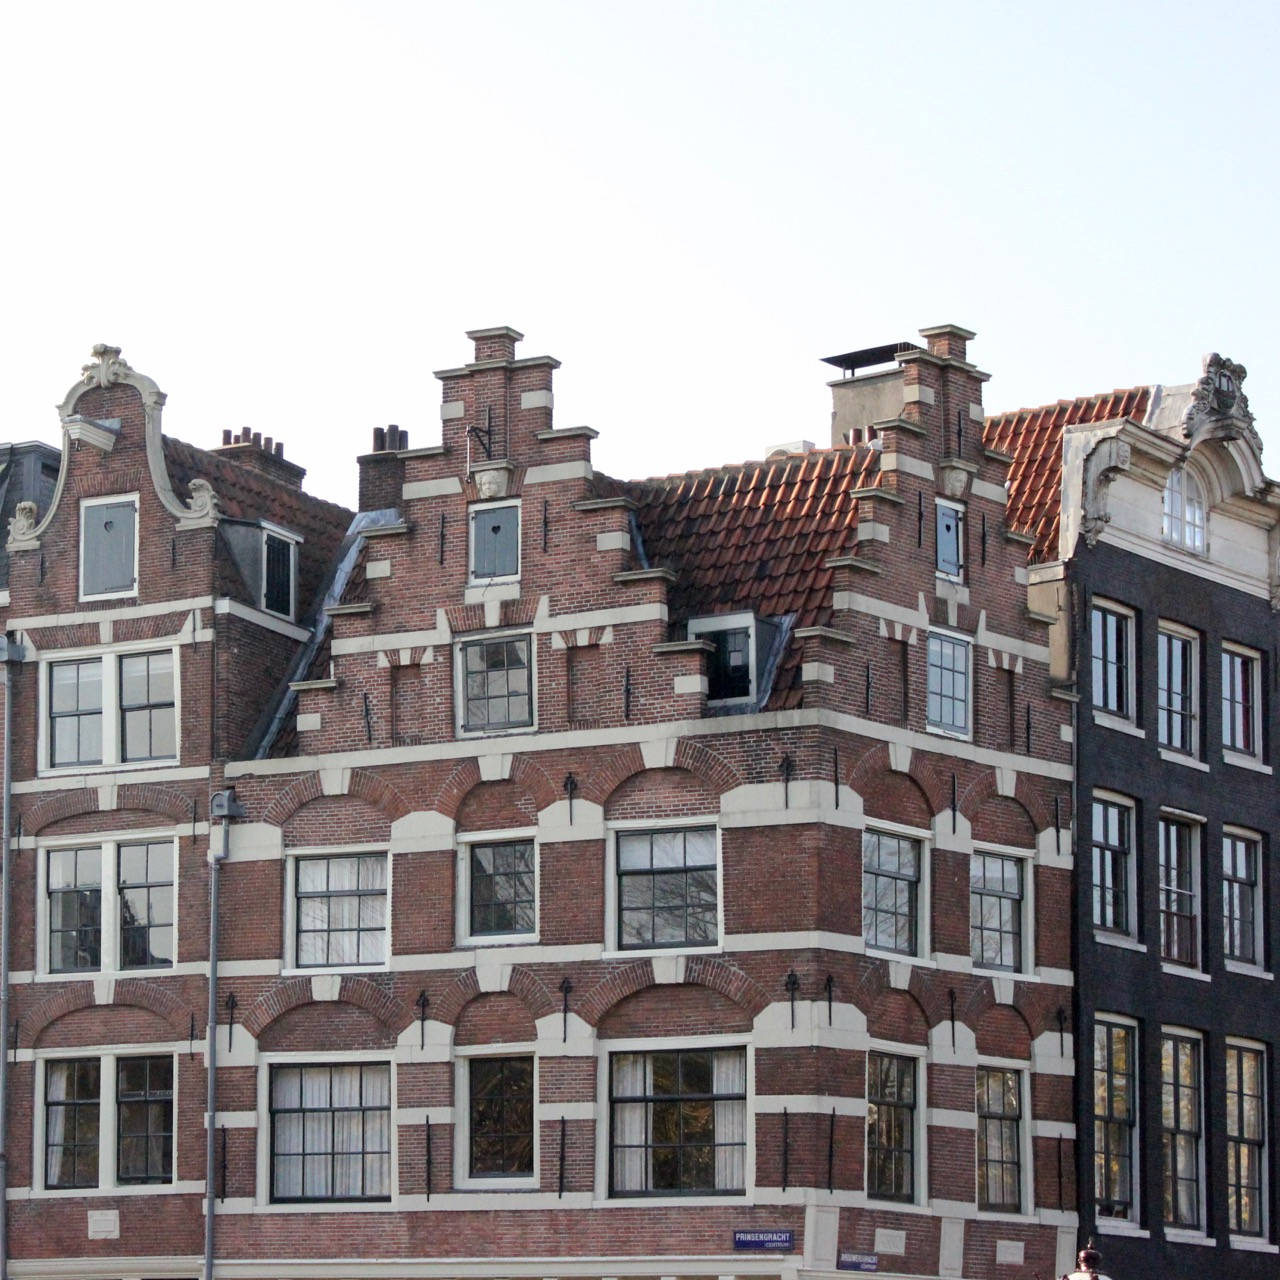 Amsterdam, Netherlands - 14